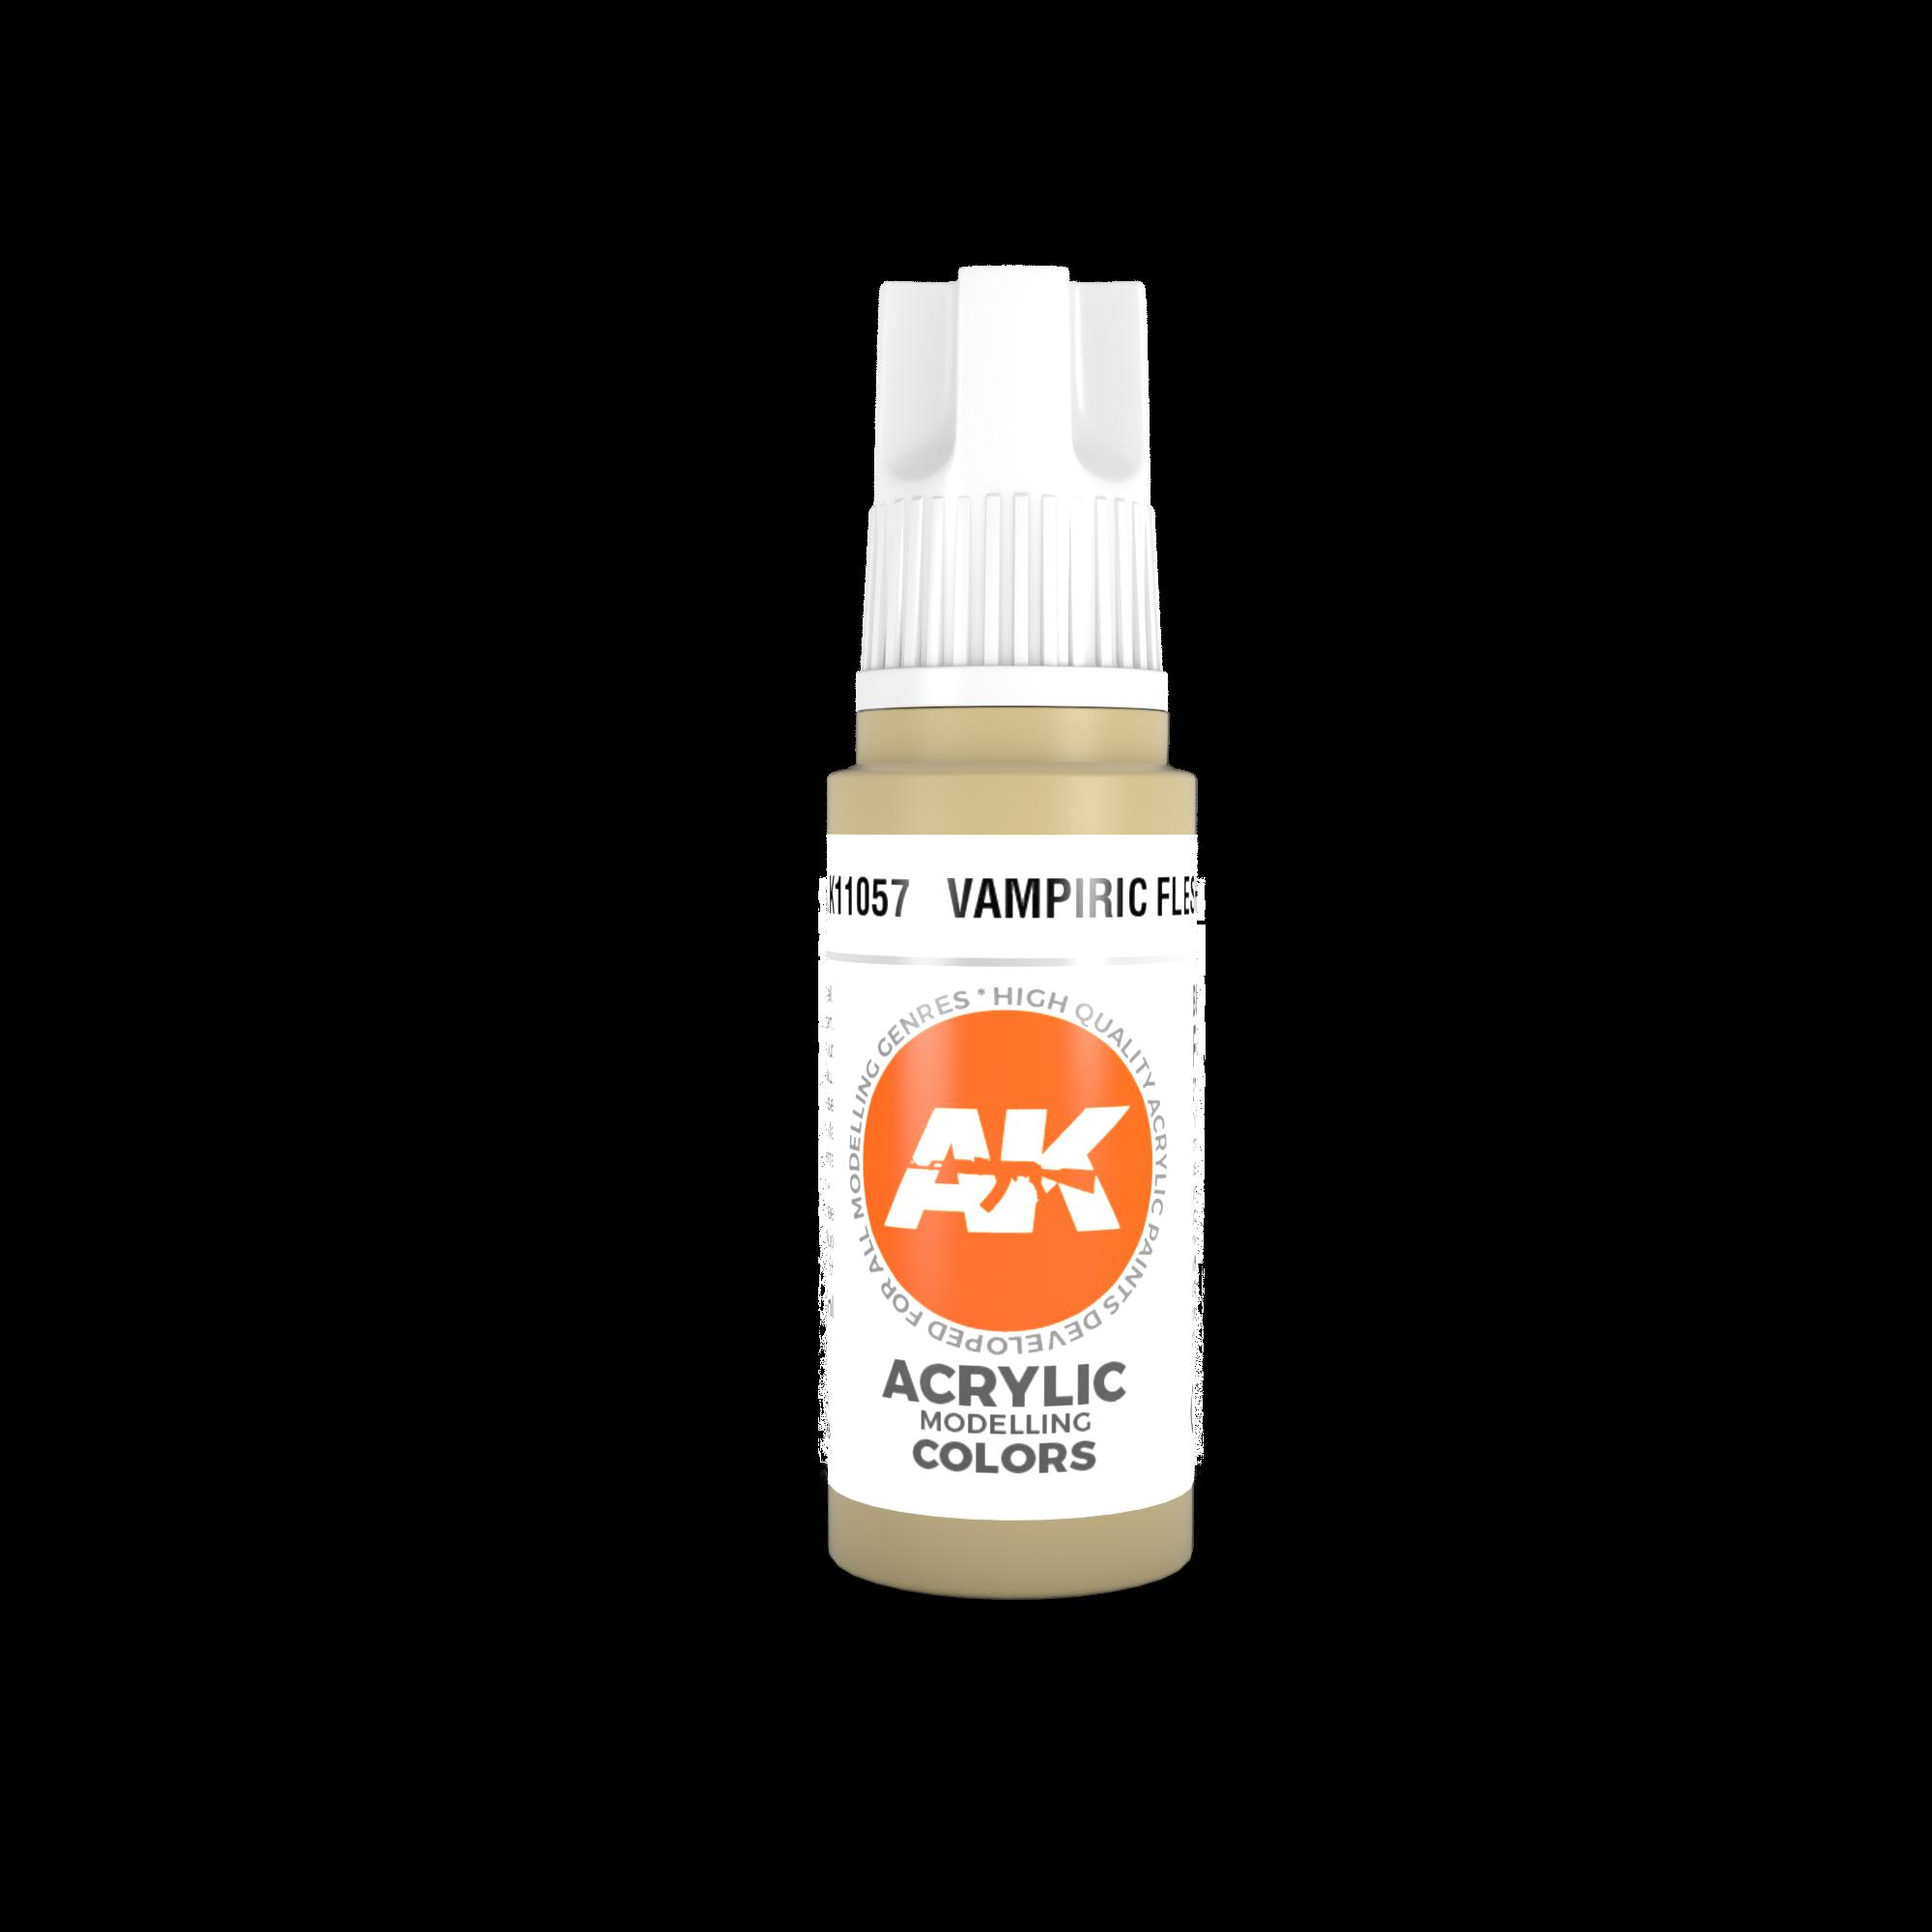 AK-Interactive Vampiric Flesh Acrylic Modelling Color - 17ml - AK-11057